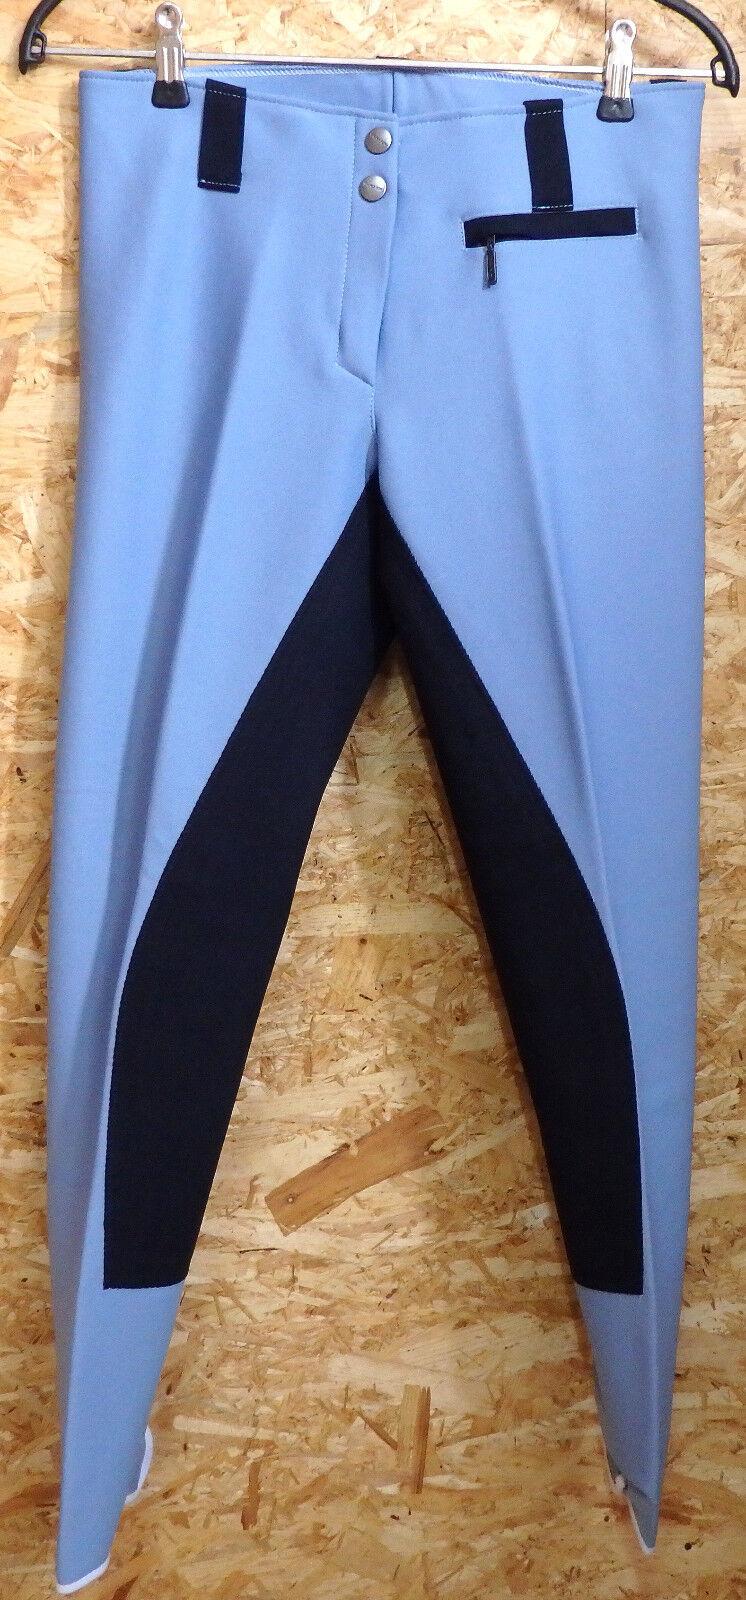 Jumper King  Reithose, 3 4 Vollbesatz,Gr. 80, Hellblue blue  (30)